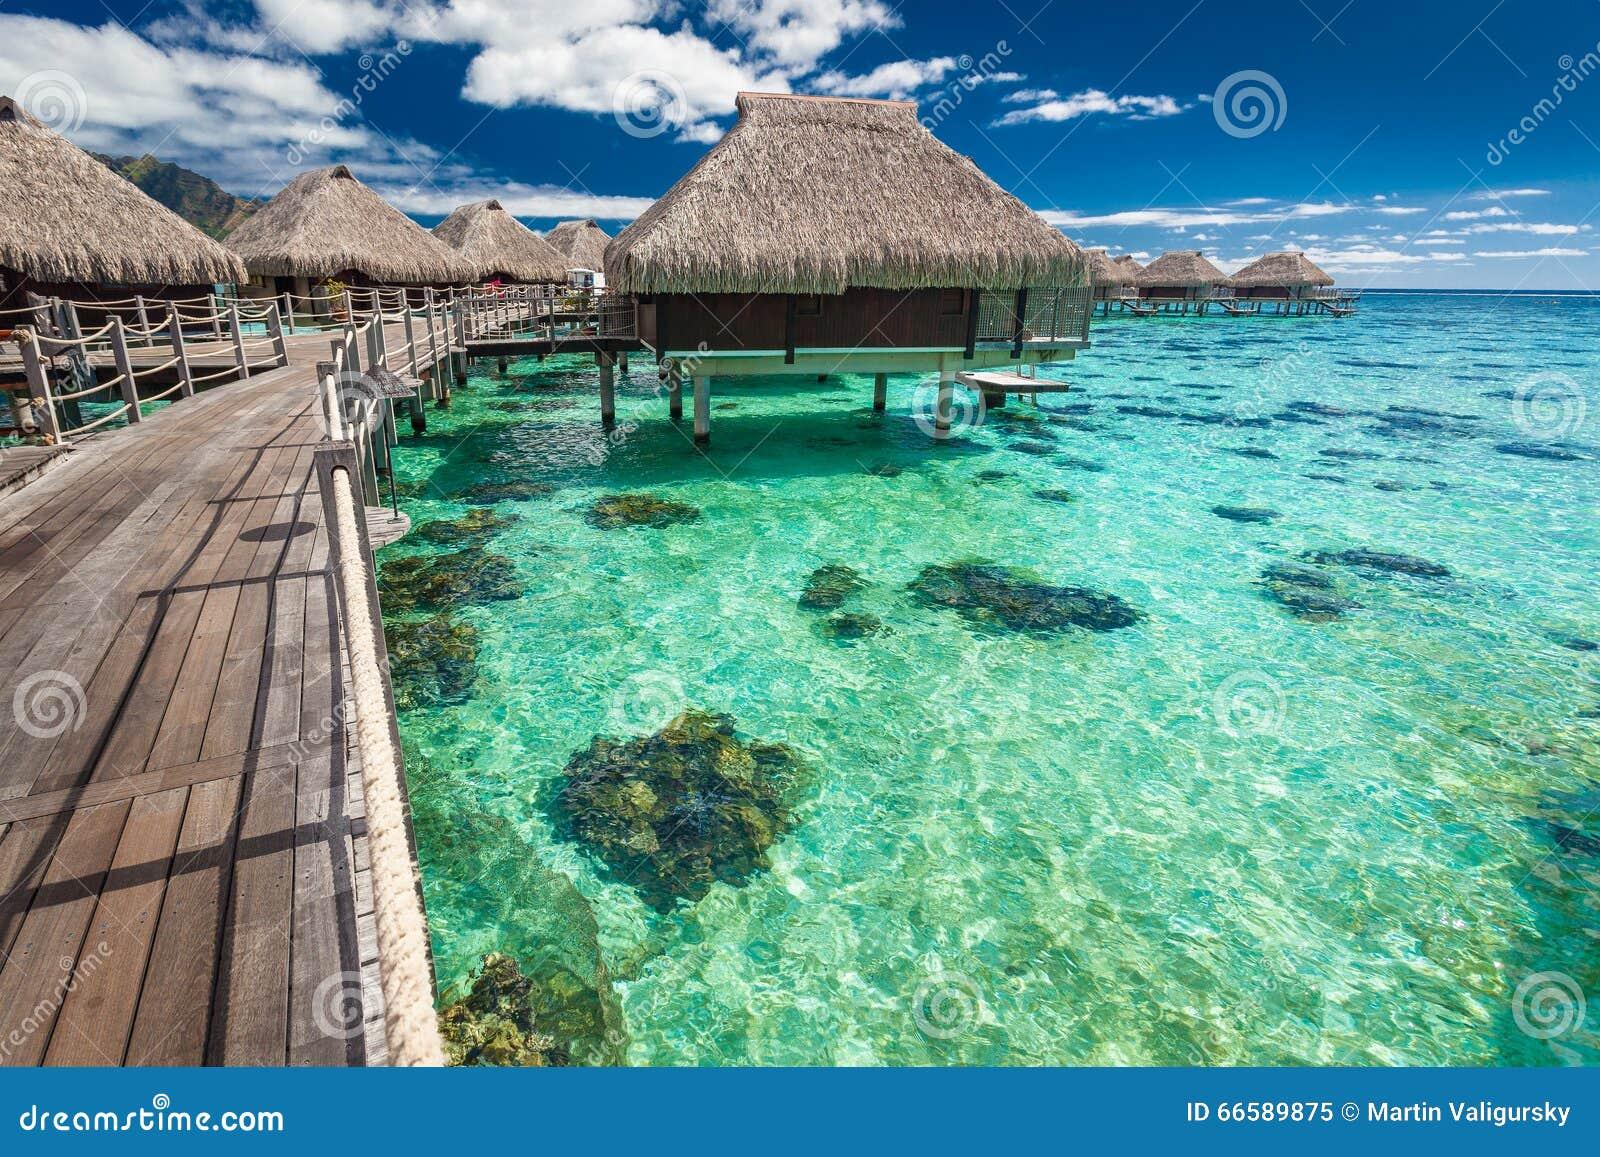 Lagoon Tropical Island: Over Water Villas On A Tropical Lagoon Of Moorea Island